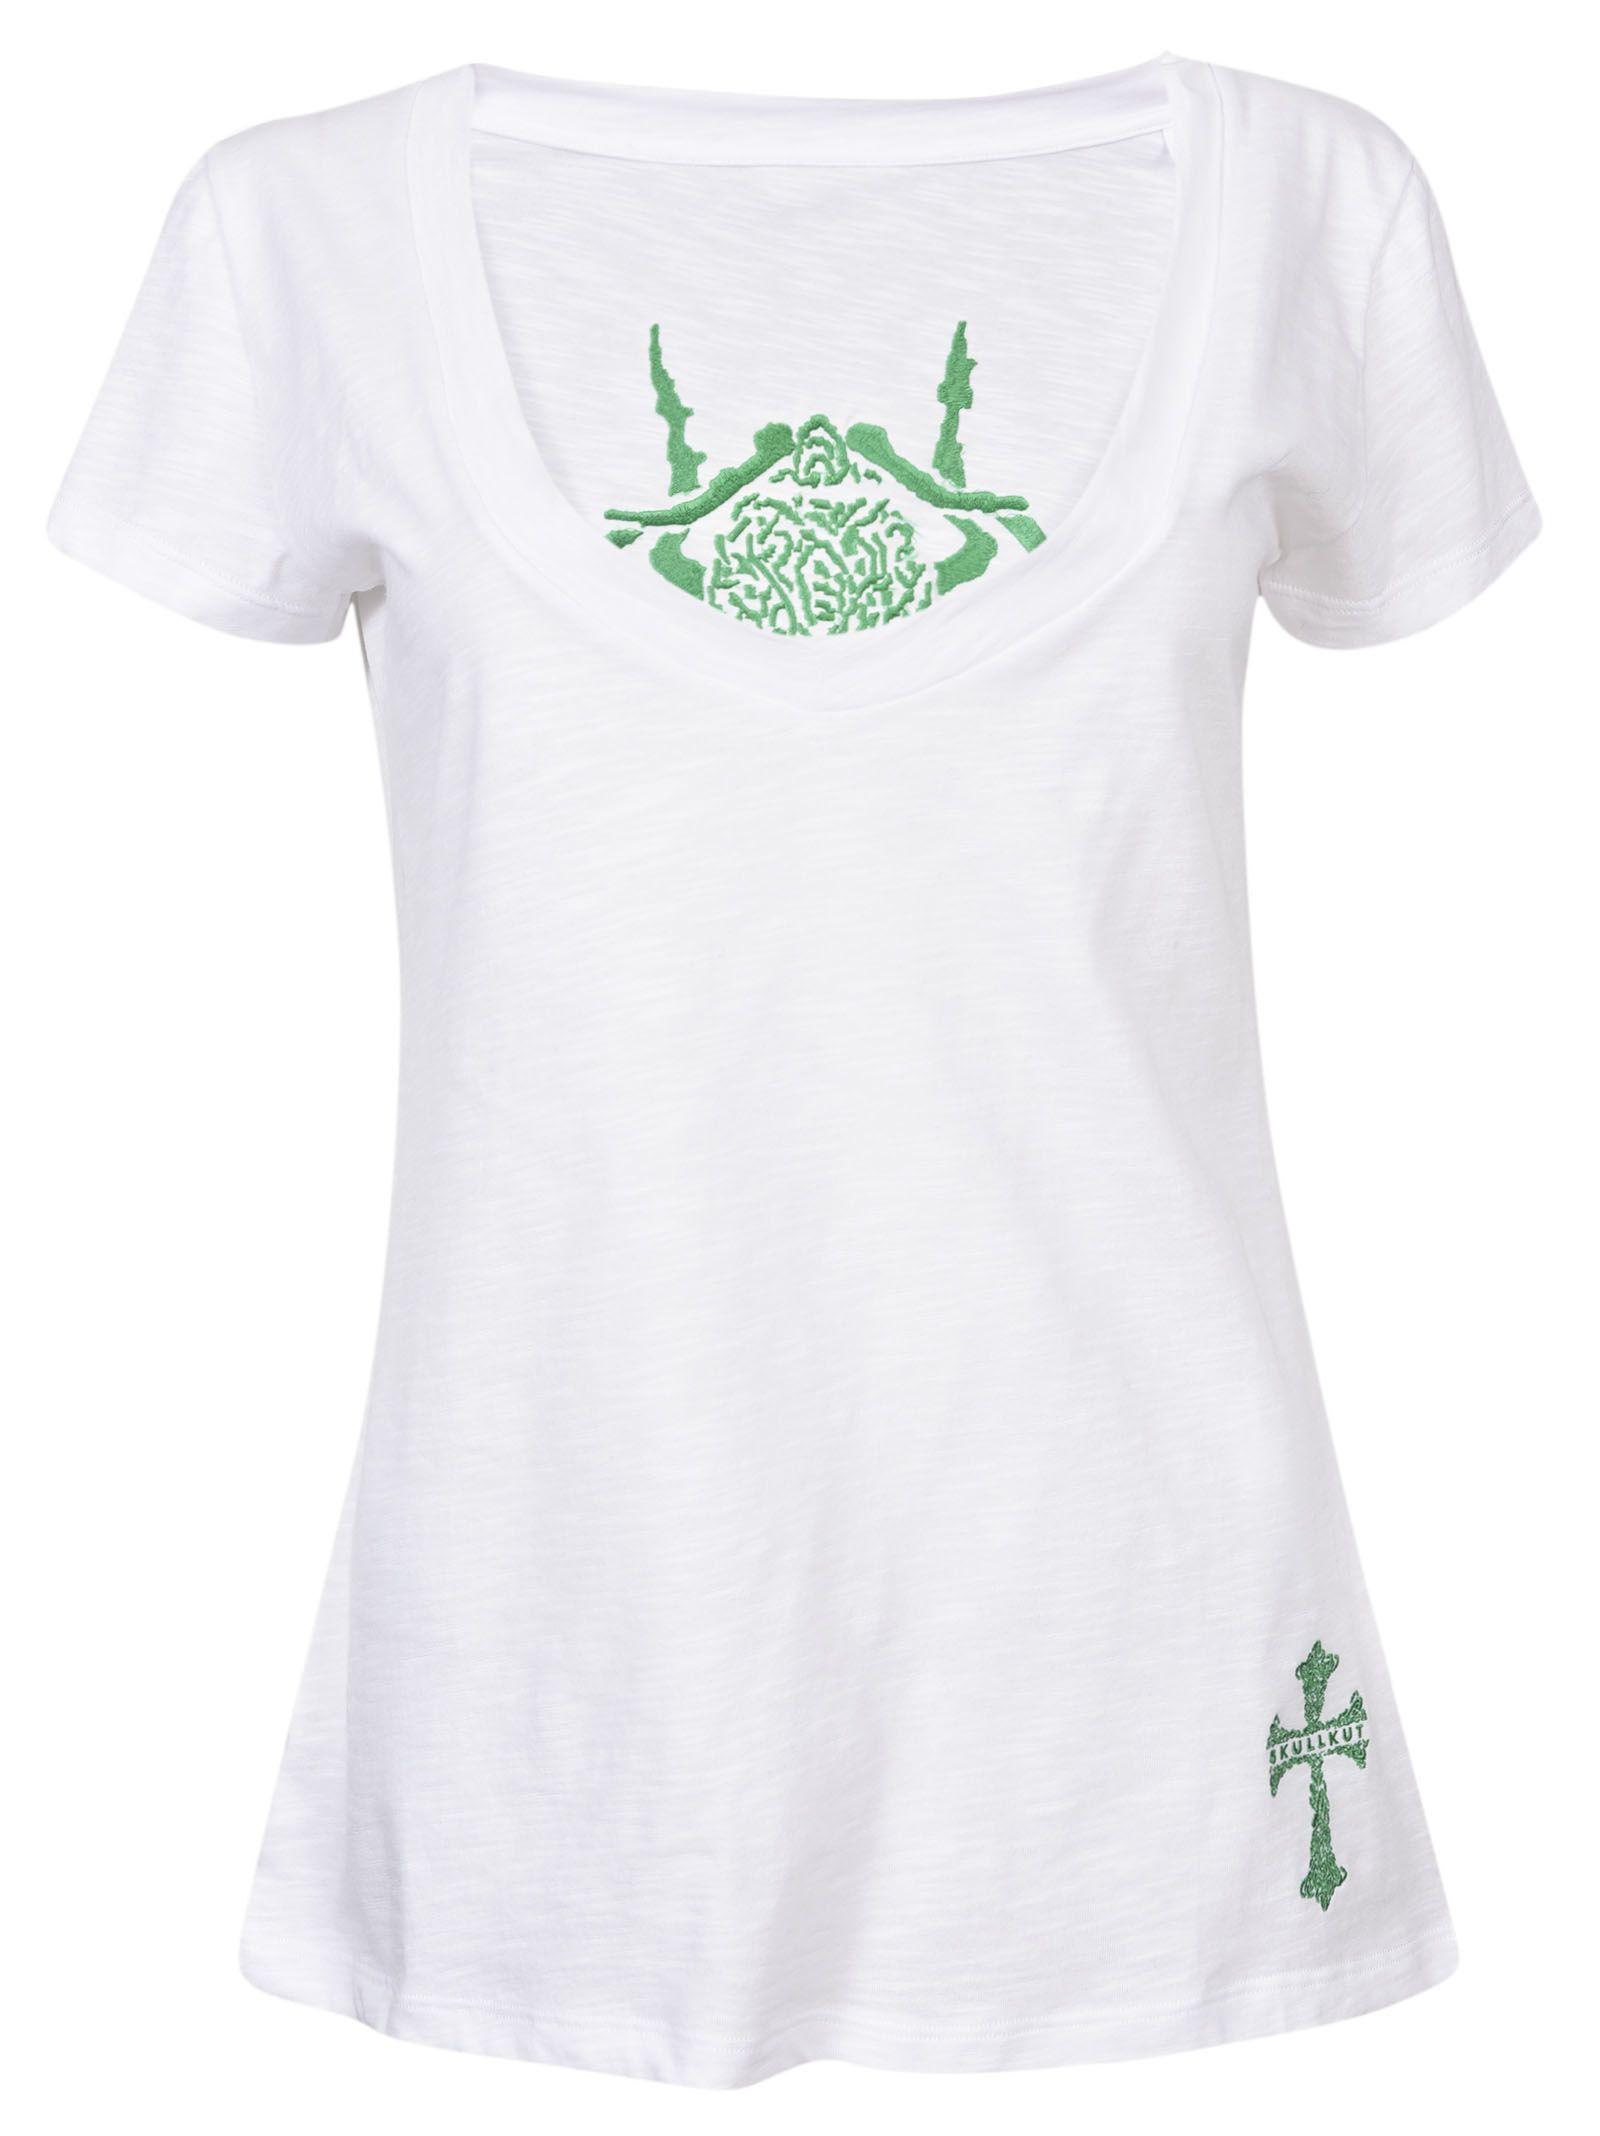 Skullkut t- shirt ciliated beetle